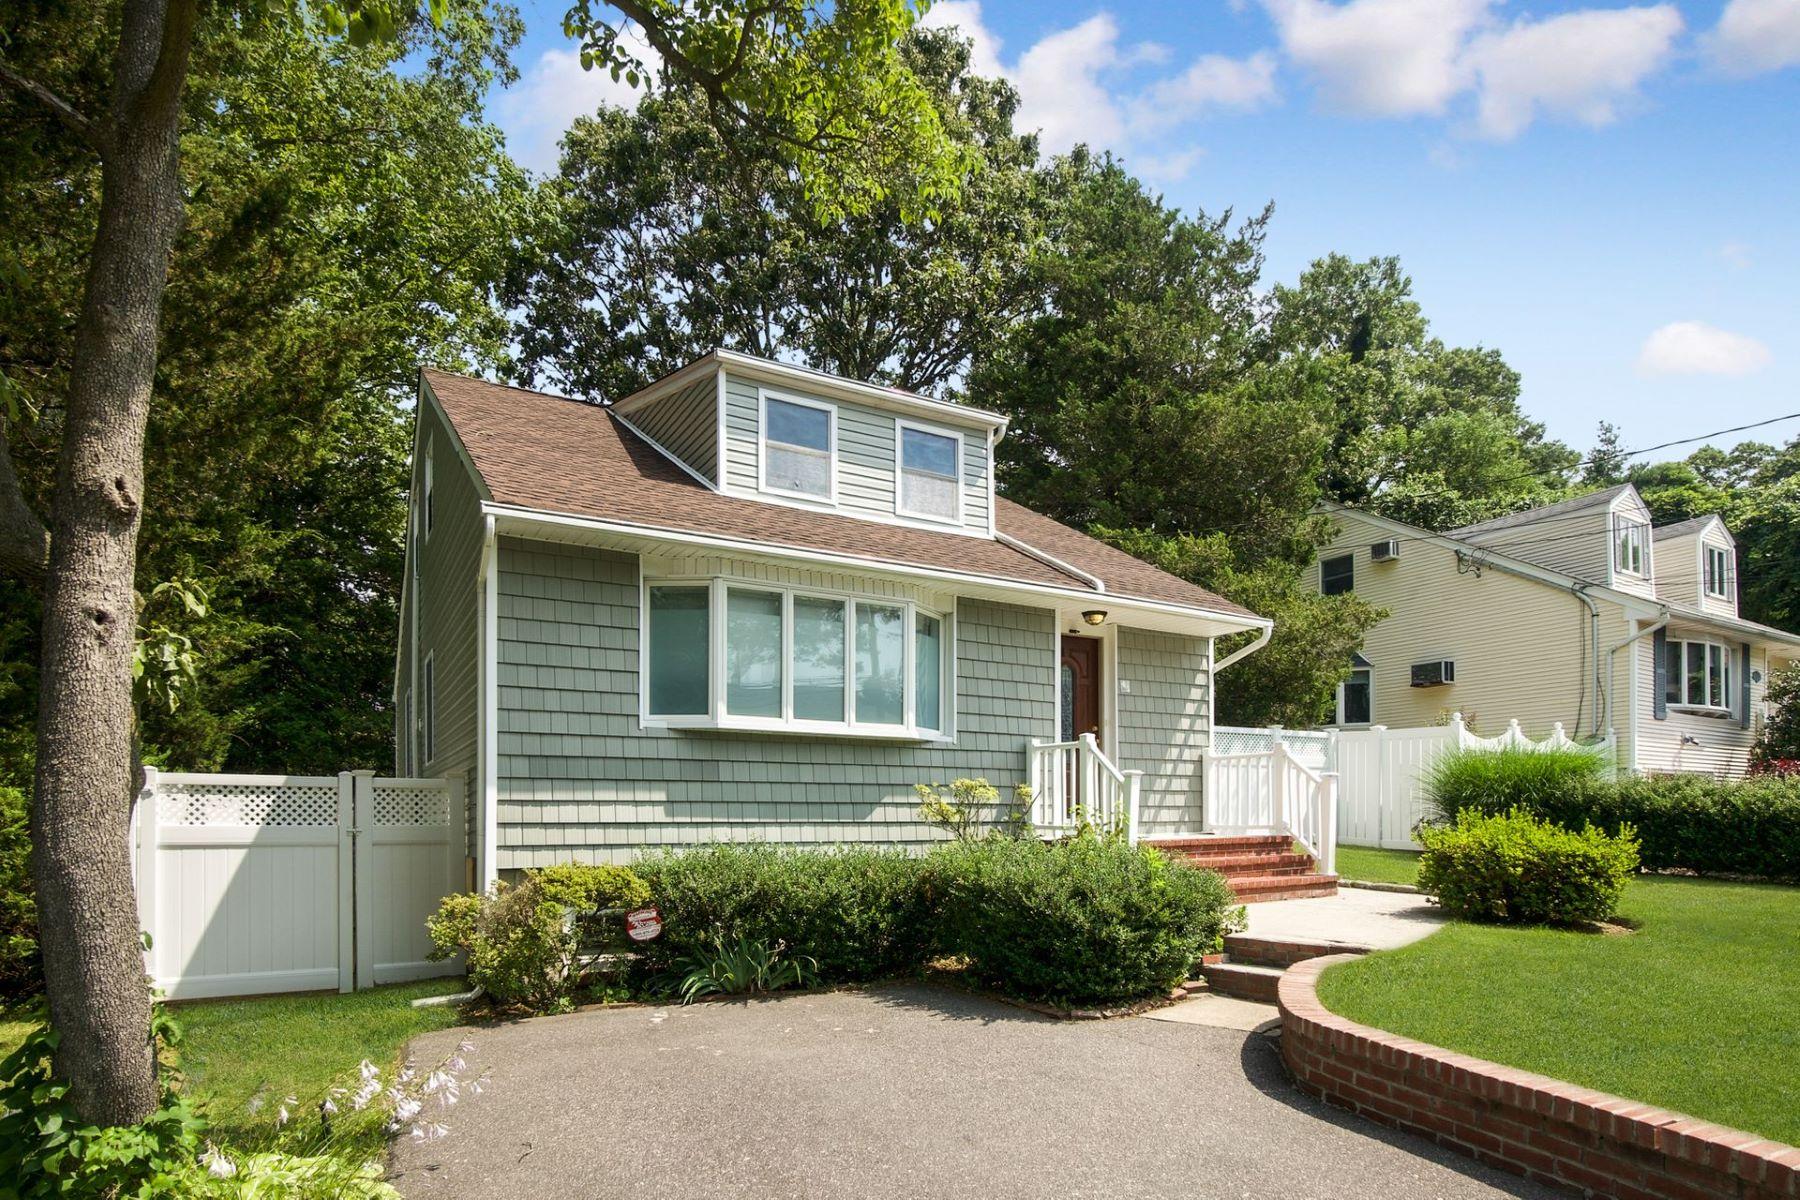 Single Family Homes for Sale at Huntington Sta 41 Long Street Huntington Station, New York 11746 United States